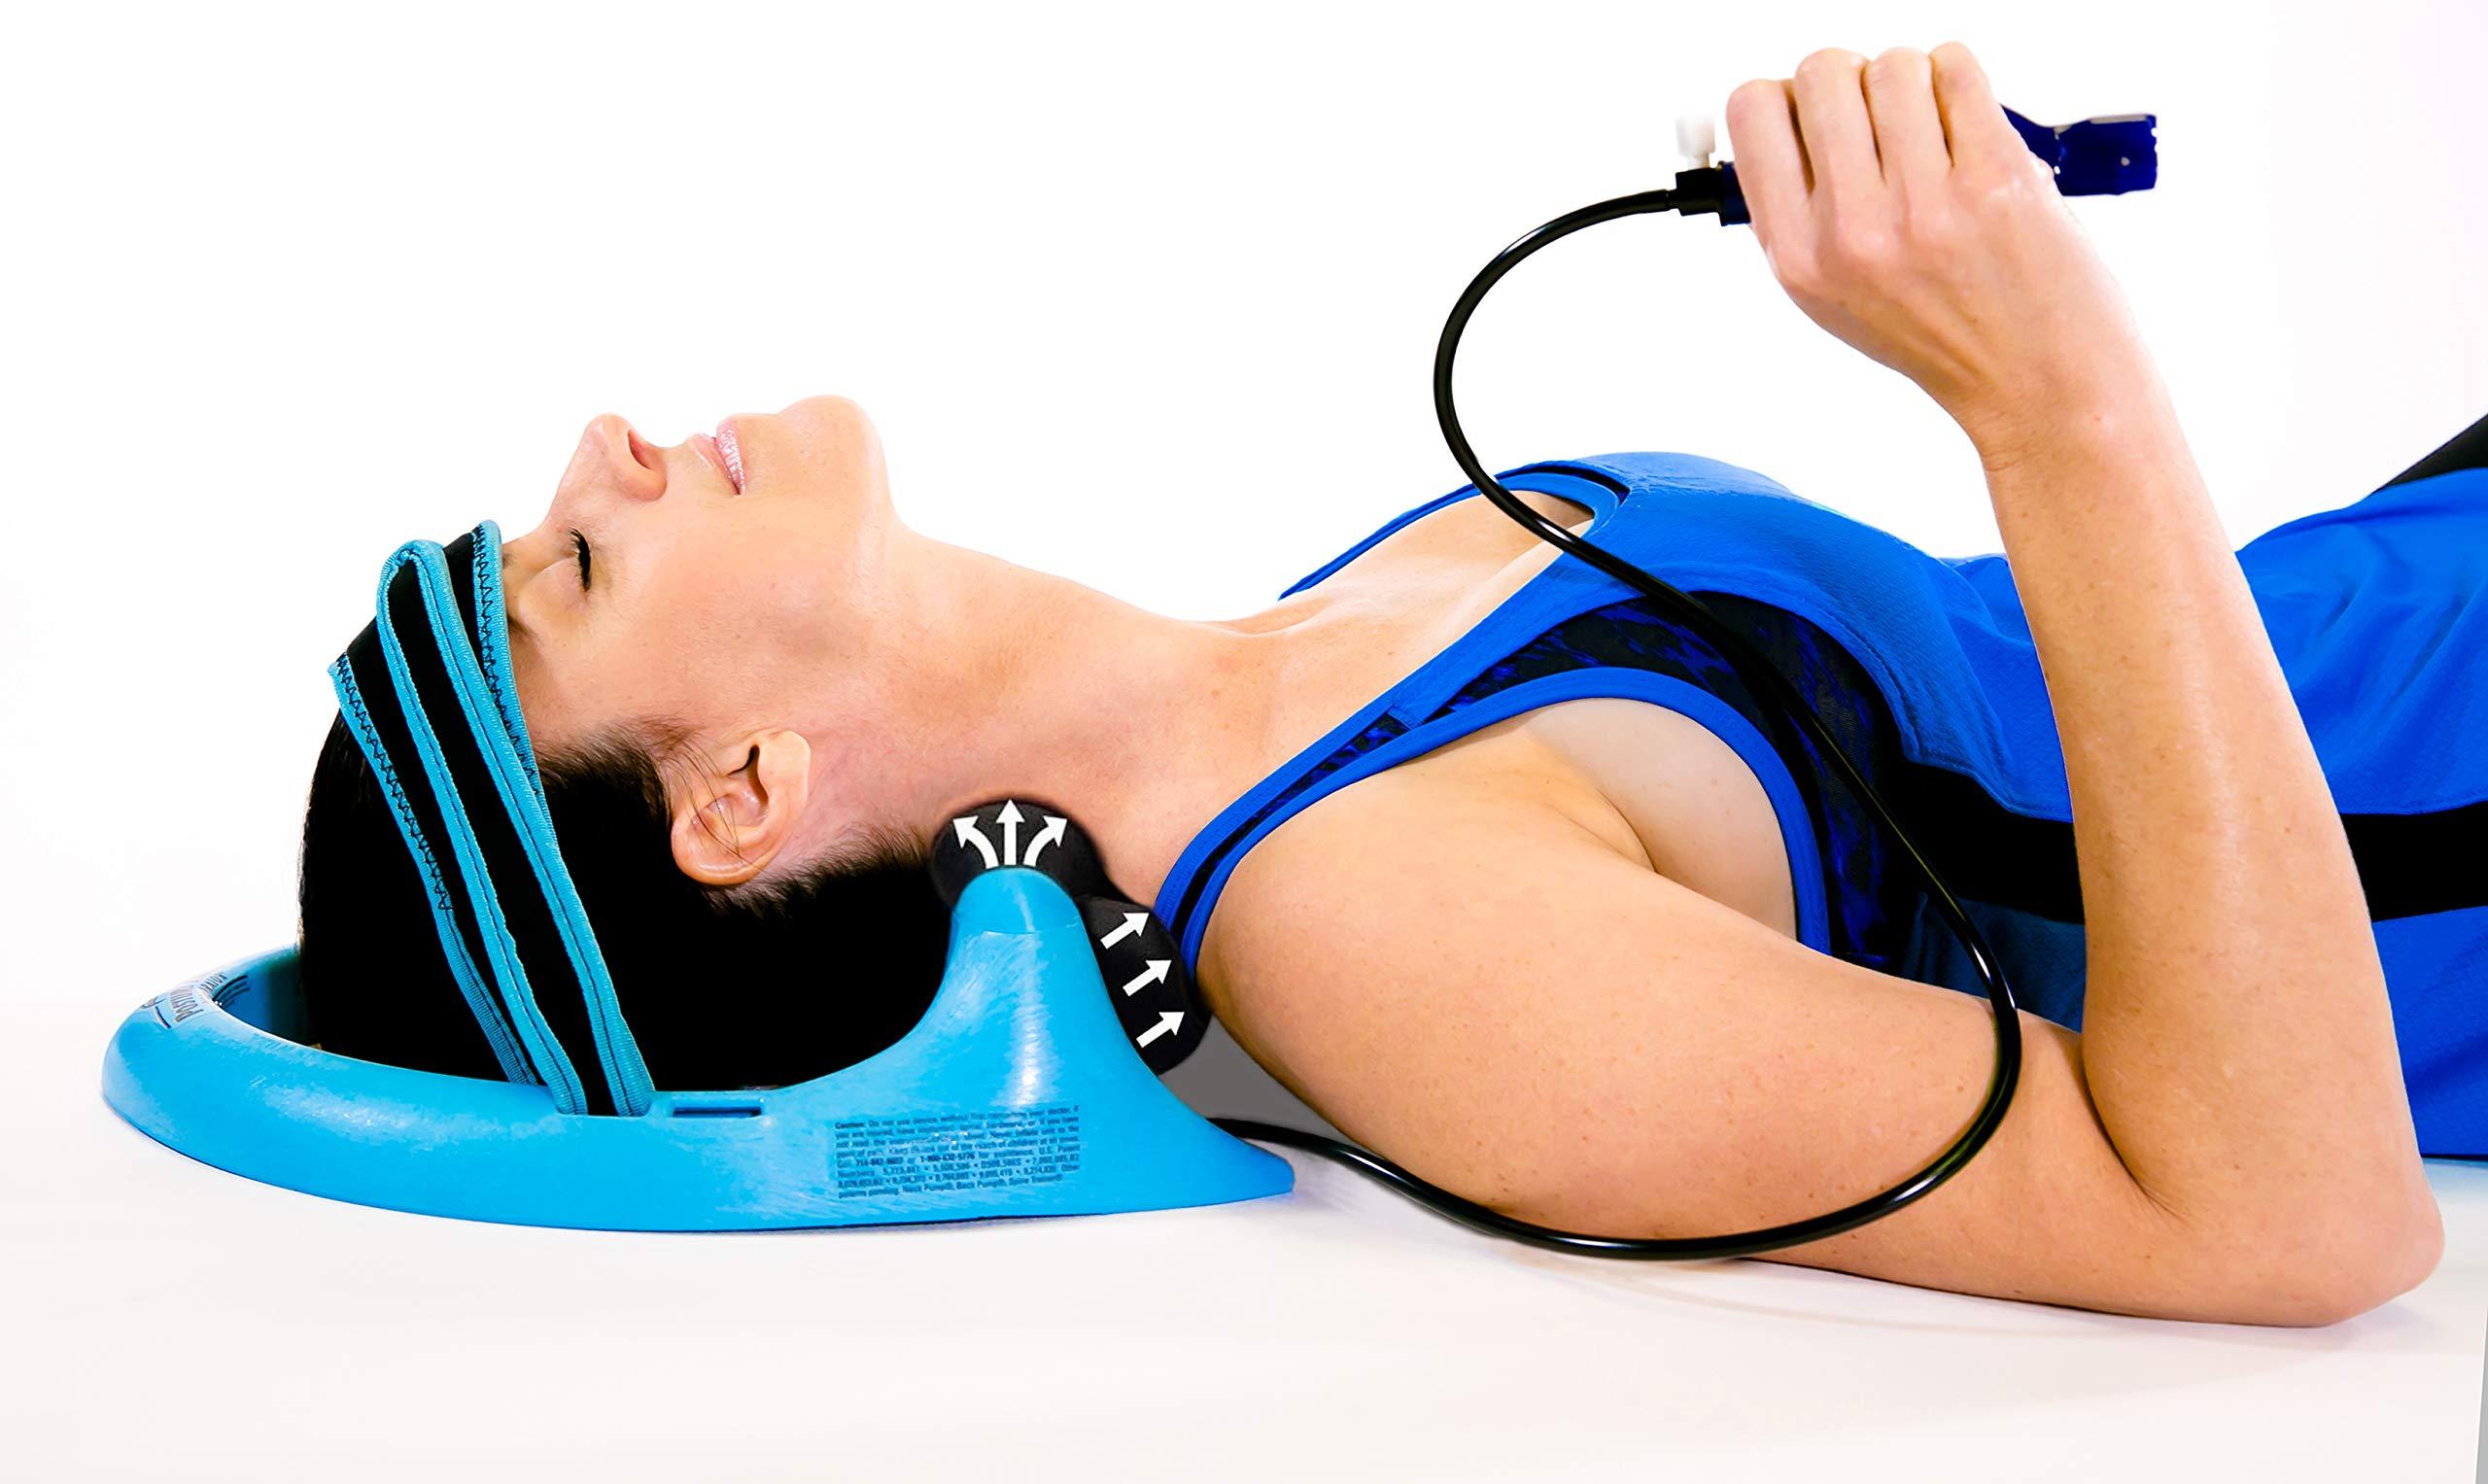 Posture Pump® 1400-D (Dual Disc Hydrator®) by Posture Pump (Image #5)